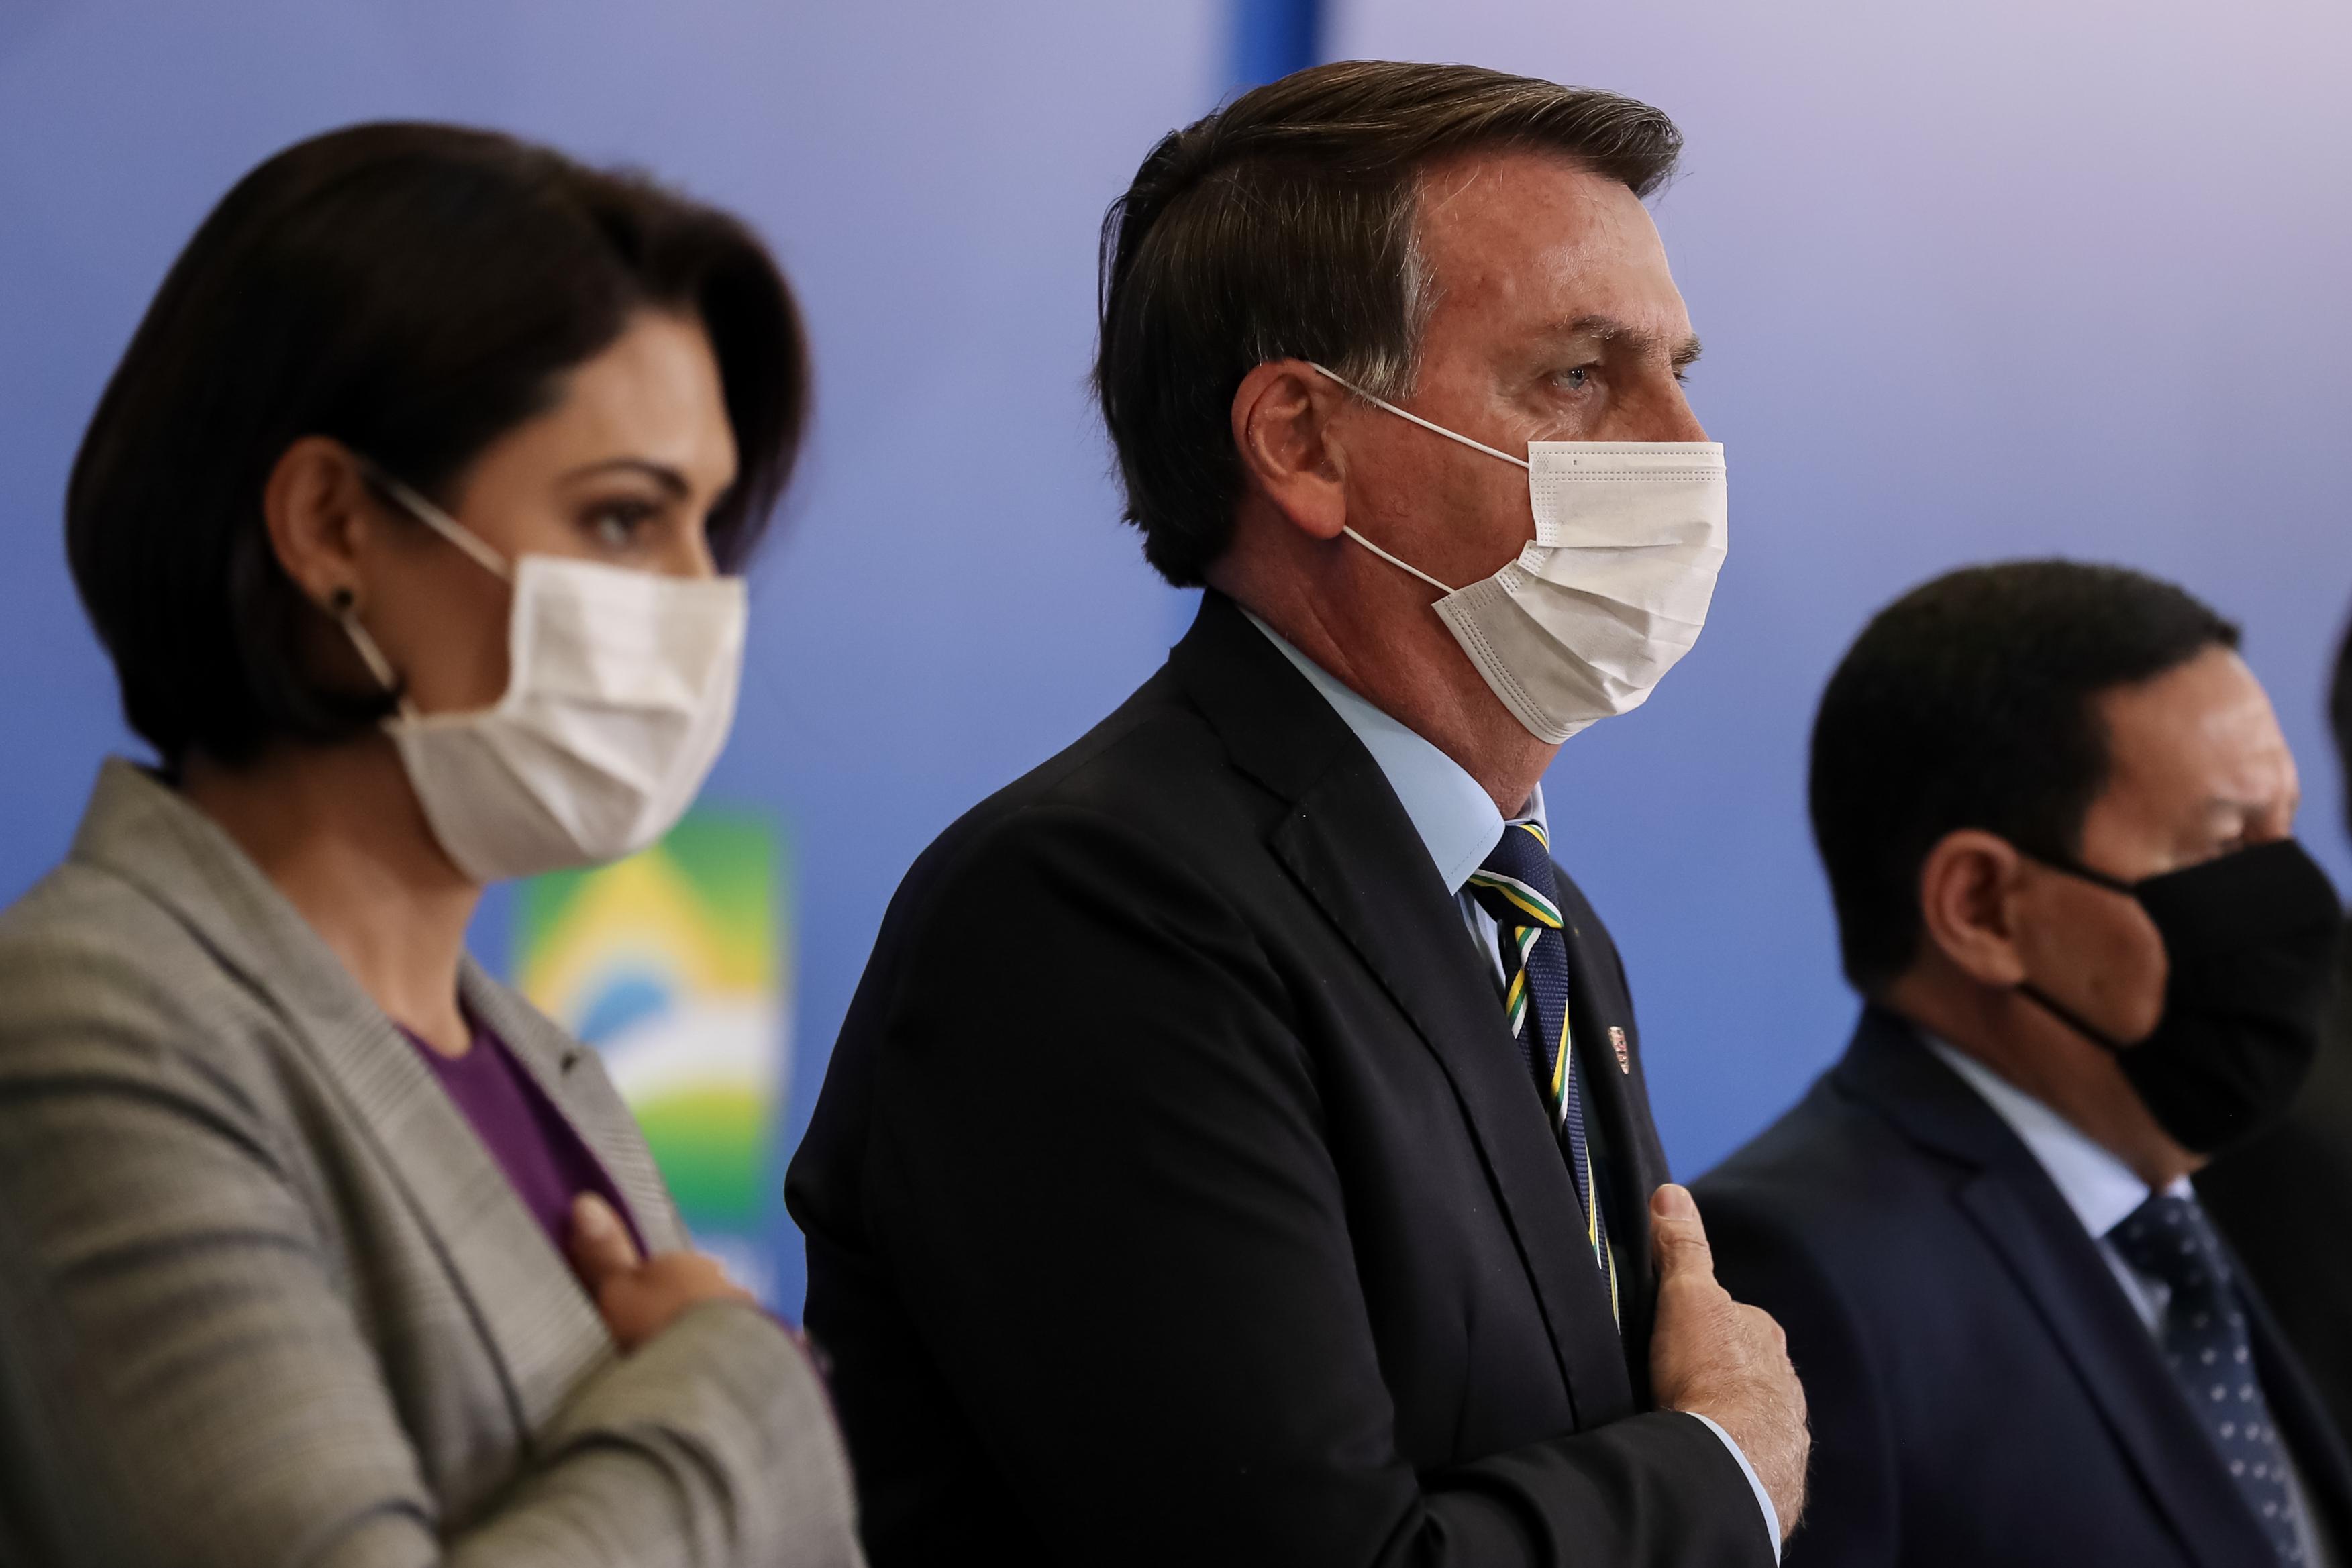 IMAGEM: Bolsonaro entre Guedes e Michelle